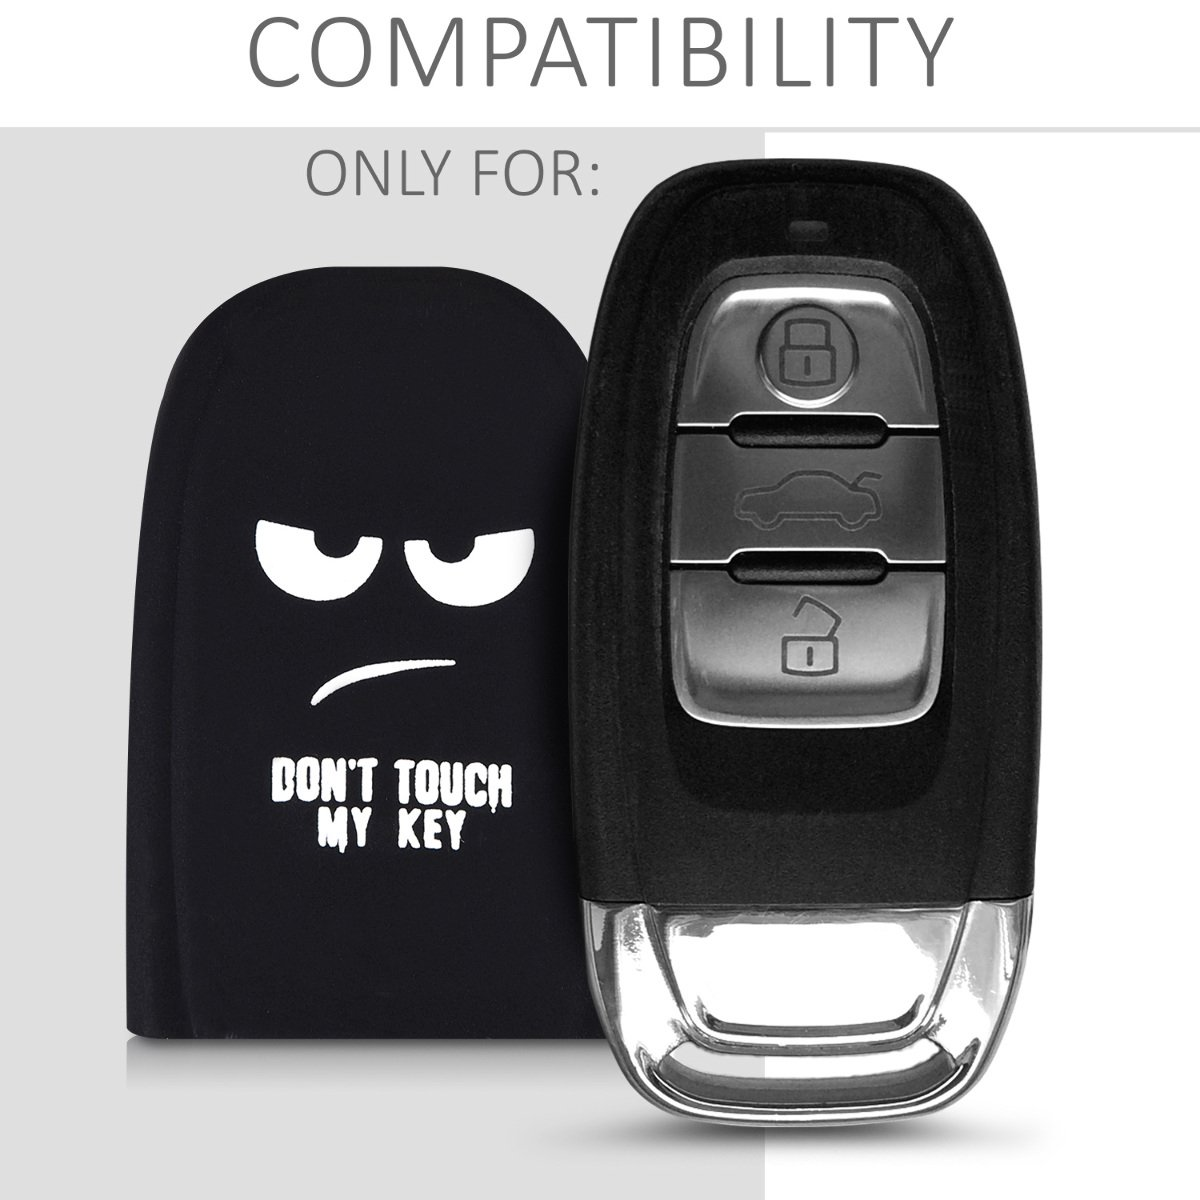 kwmobile Funda para Llave Keyless de 3 Botones para Coche Audi - Carcasa Protectora [Suave] de [Silicona] - Case de Mando de Auto con diseño Dont ...